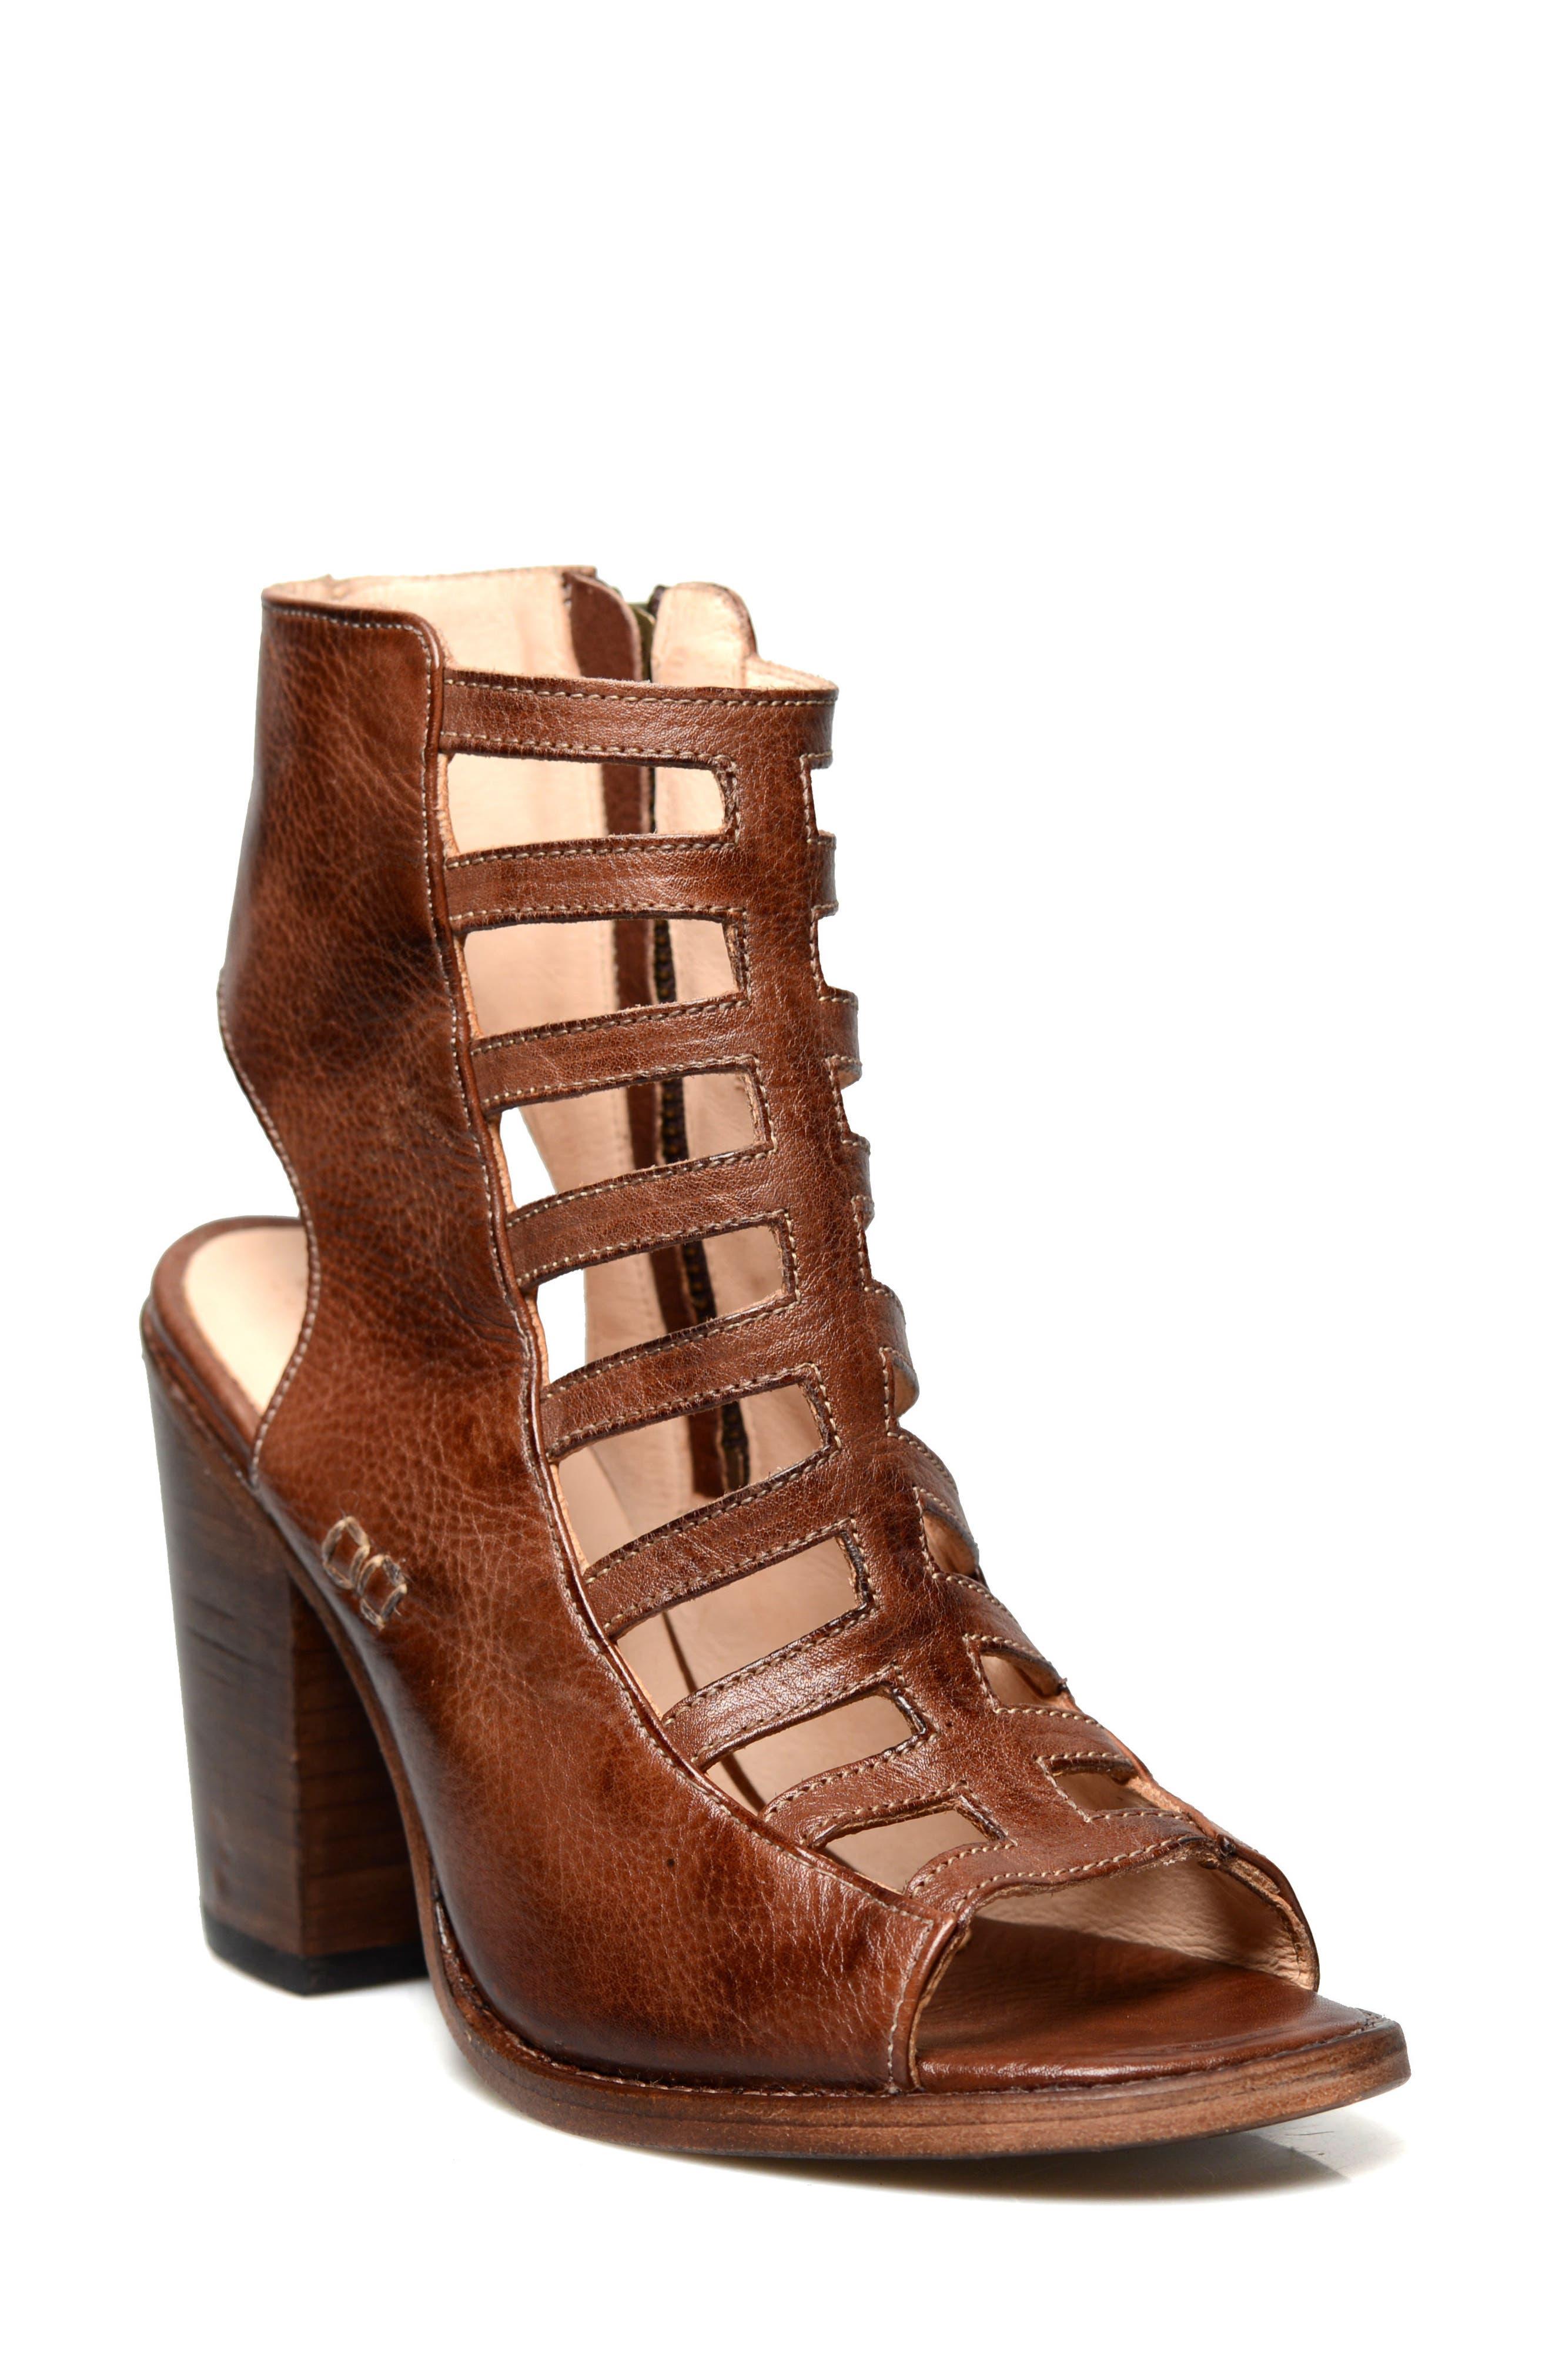 Occam Caged Sandal,                             Main thumbnail 1, color,                             Teak Rustic Leather